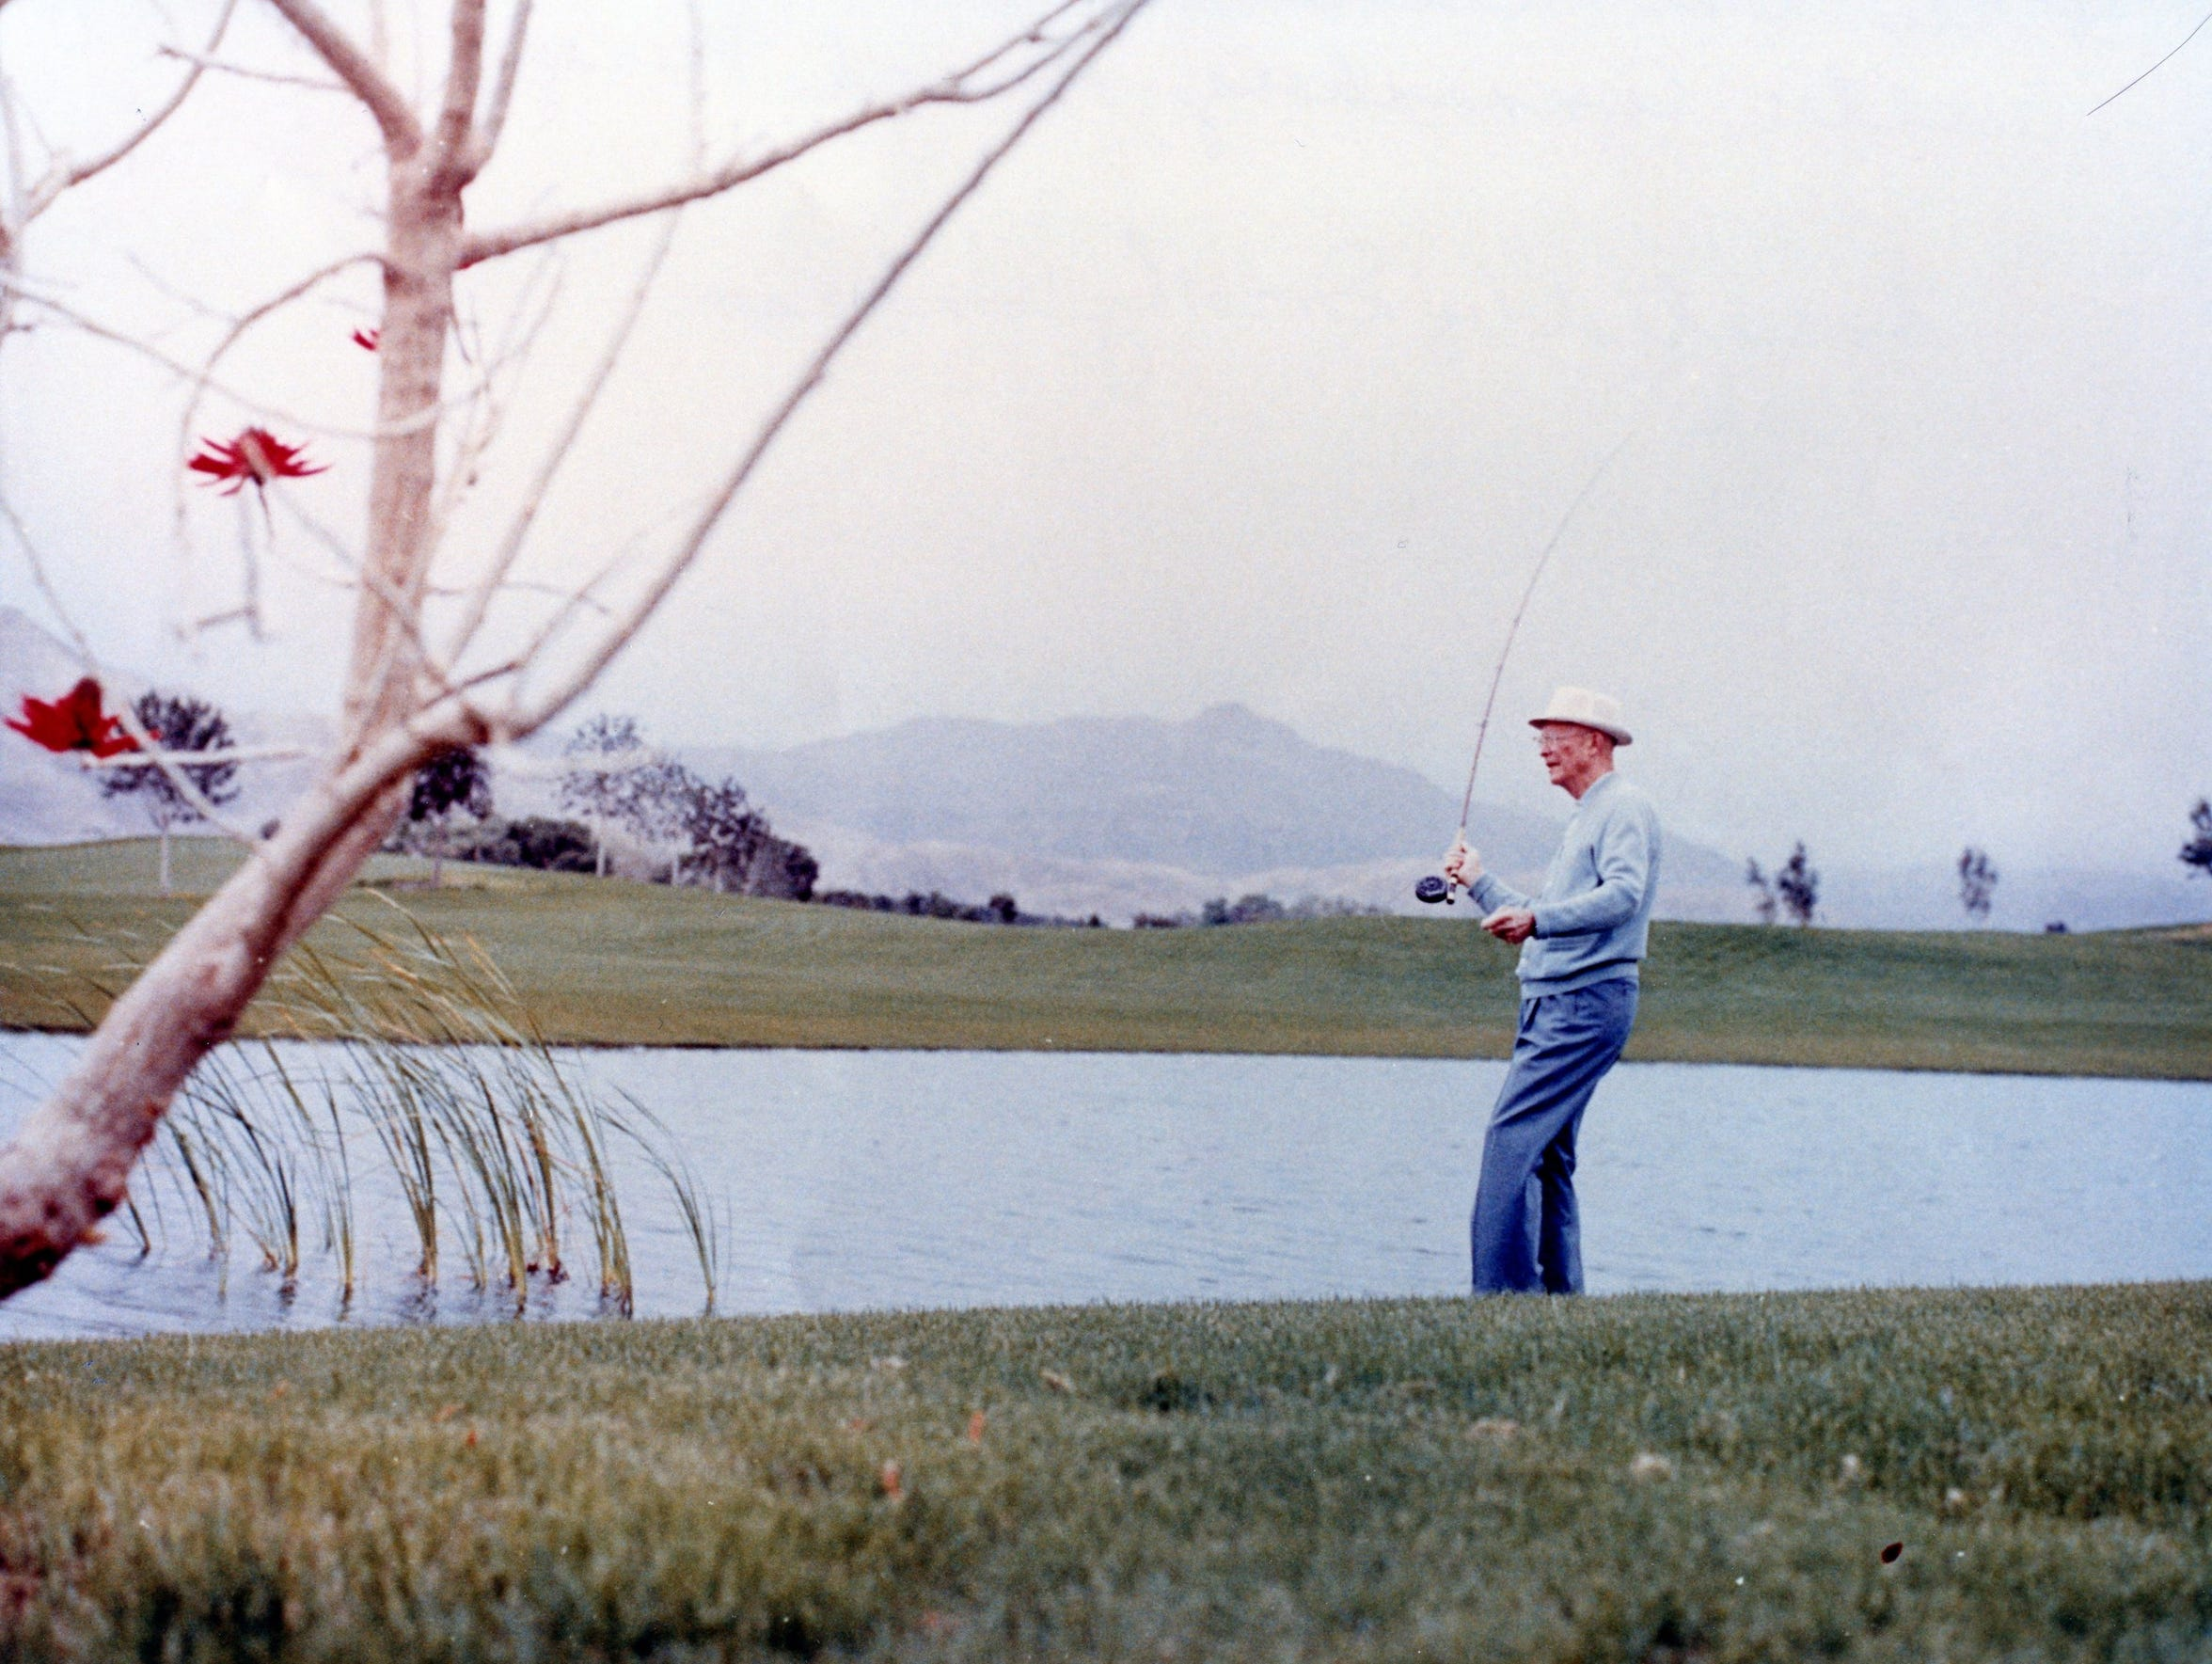 Pres. Eisenhower fishing at Annenberg Estate.